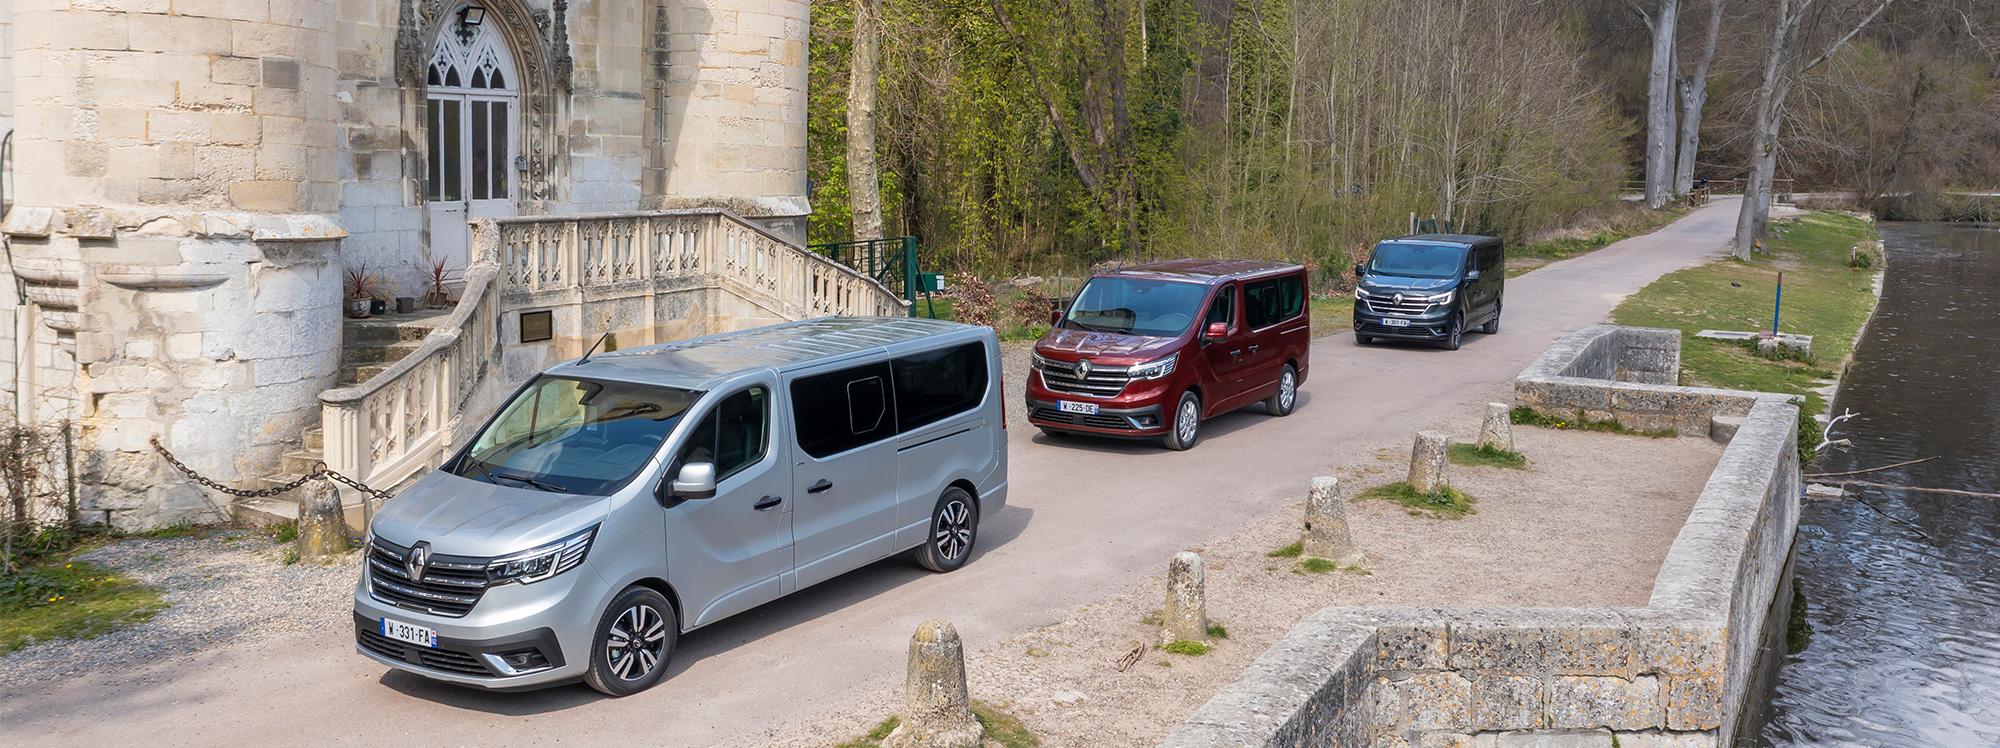 Renault estrena nueva gama de Vans